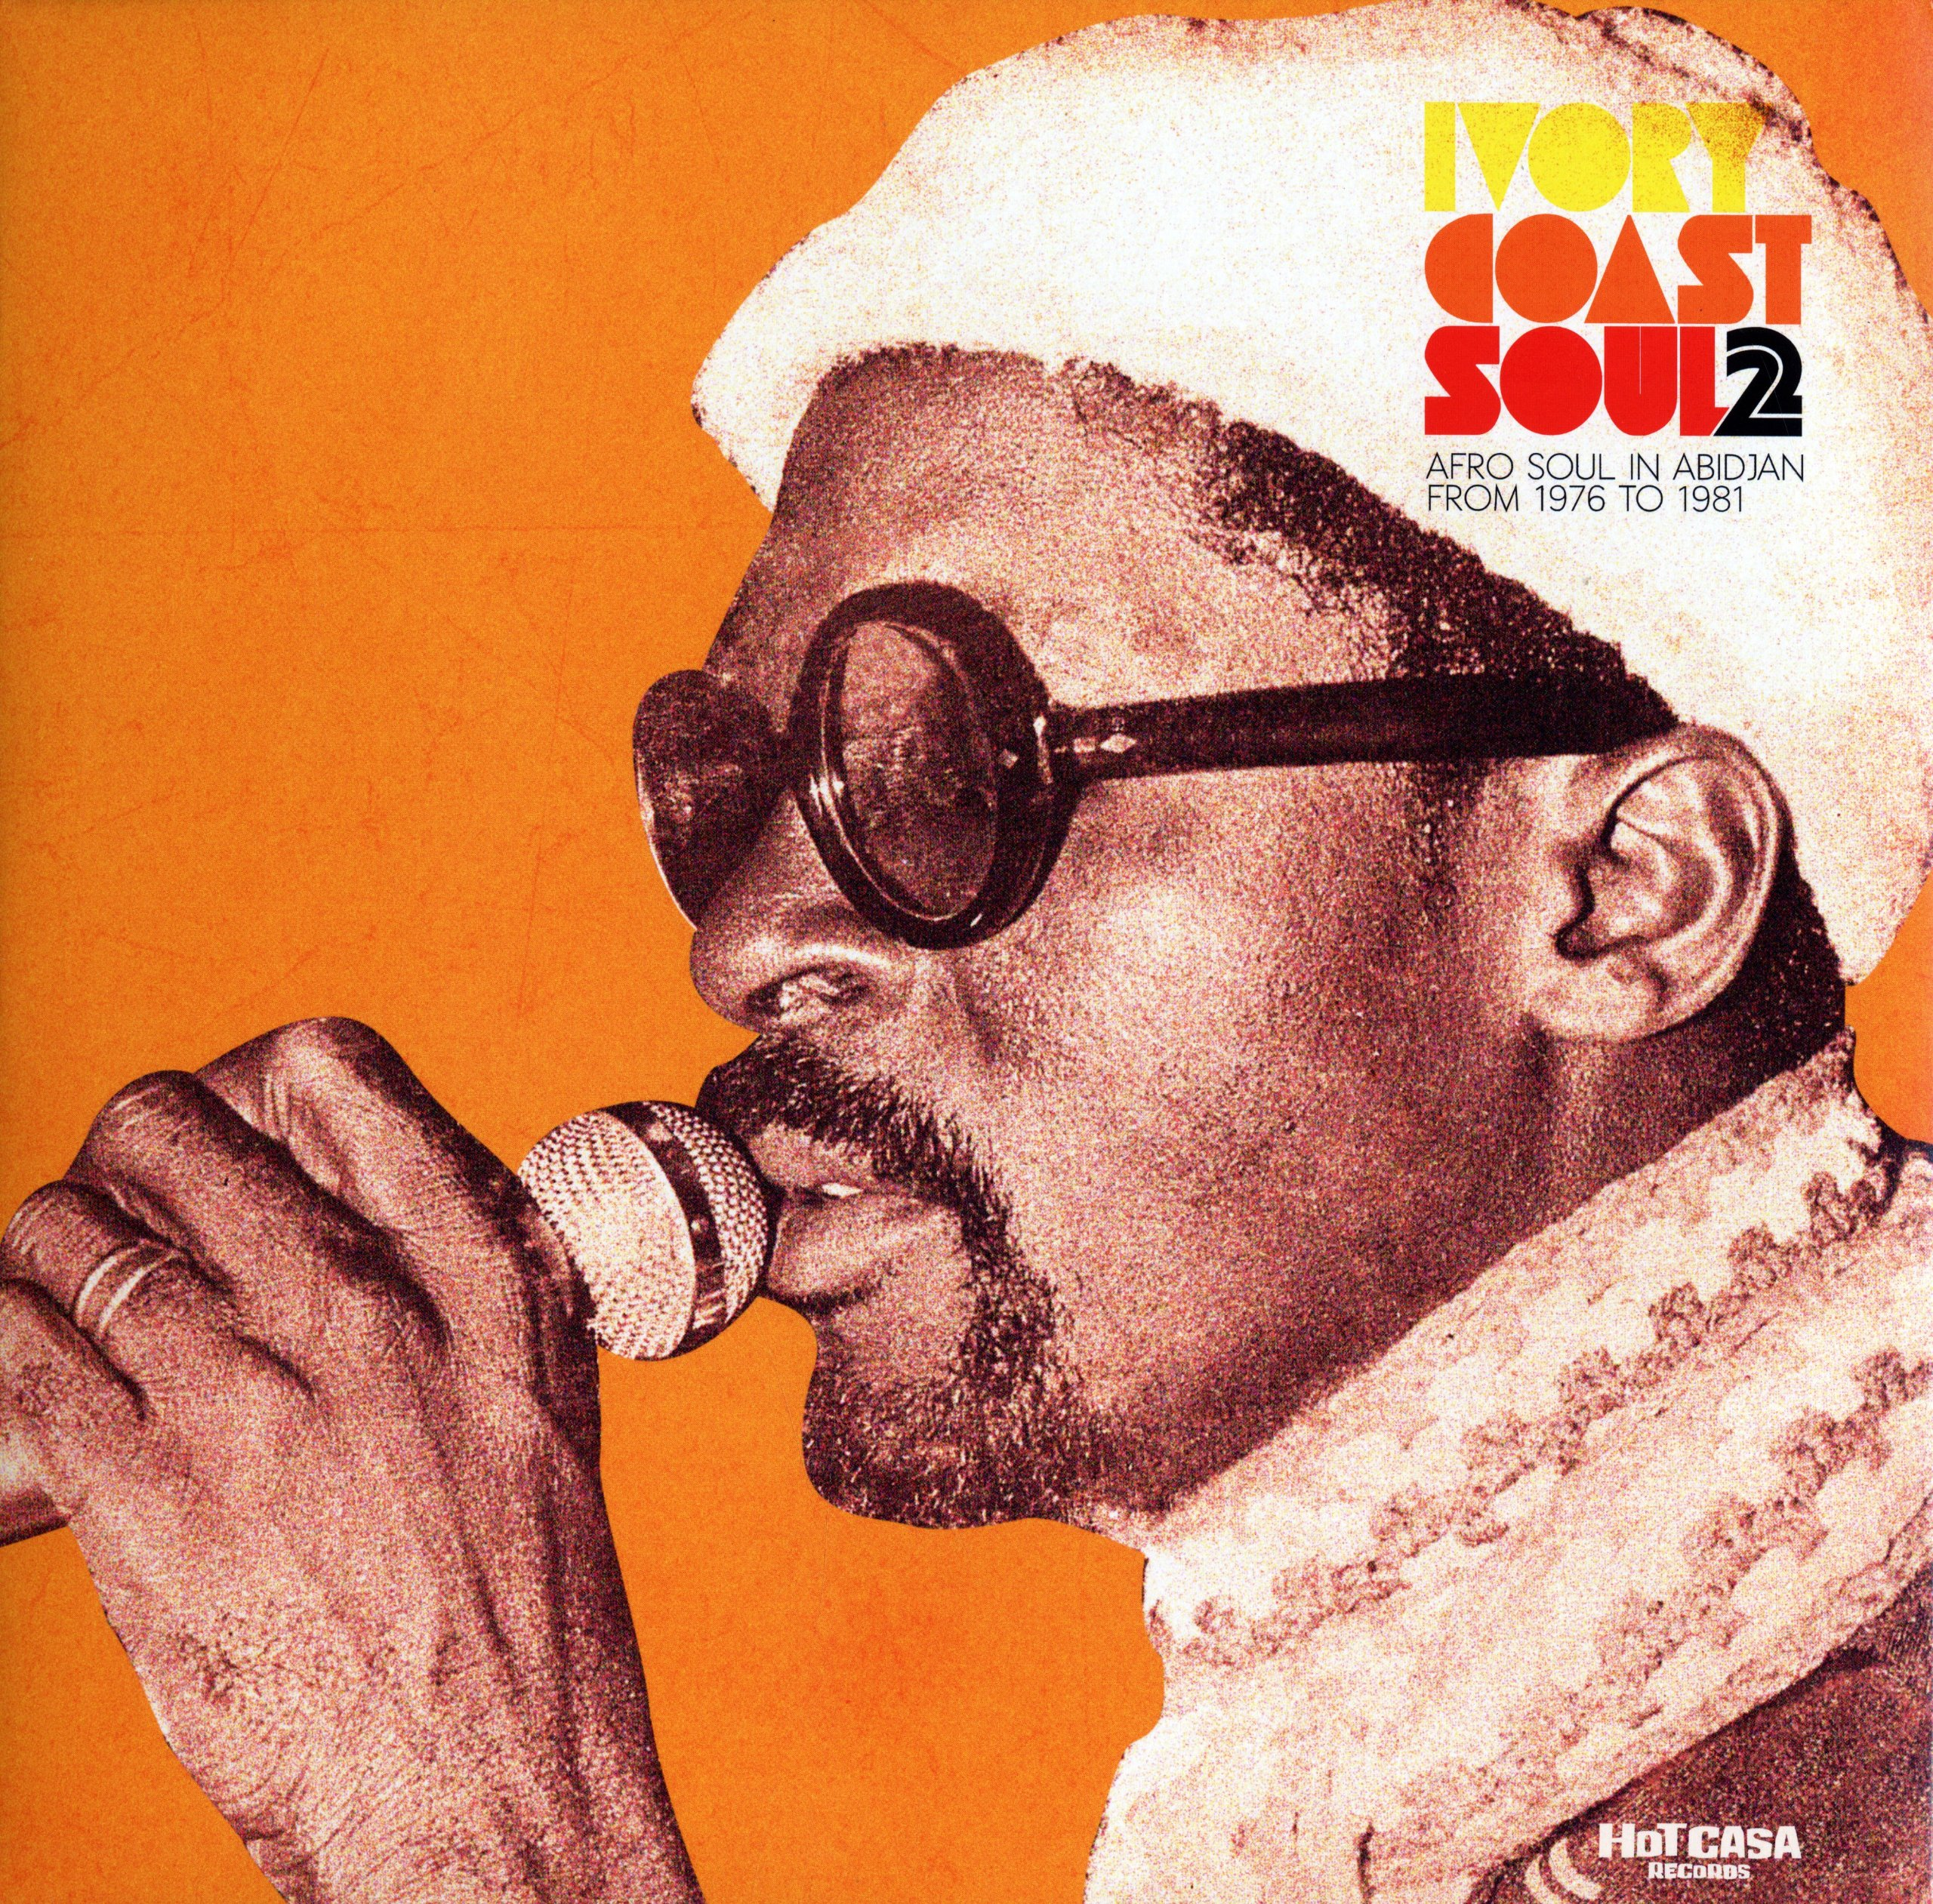 Ivory Coast Soul 2: Afrofunk In Abidjan From 1976 To 1981